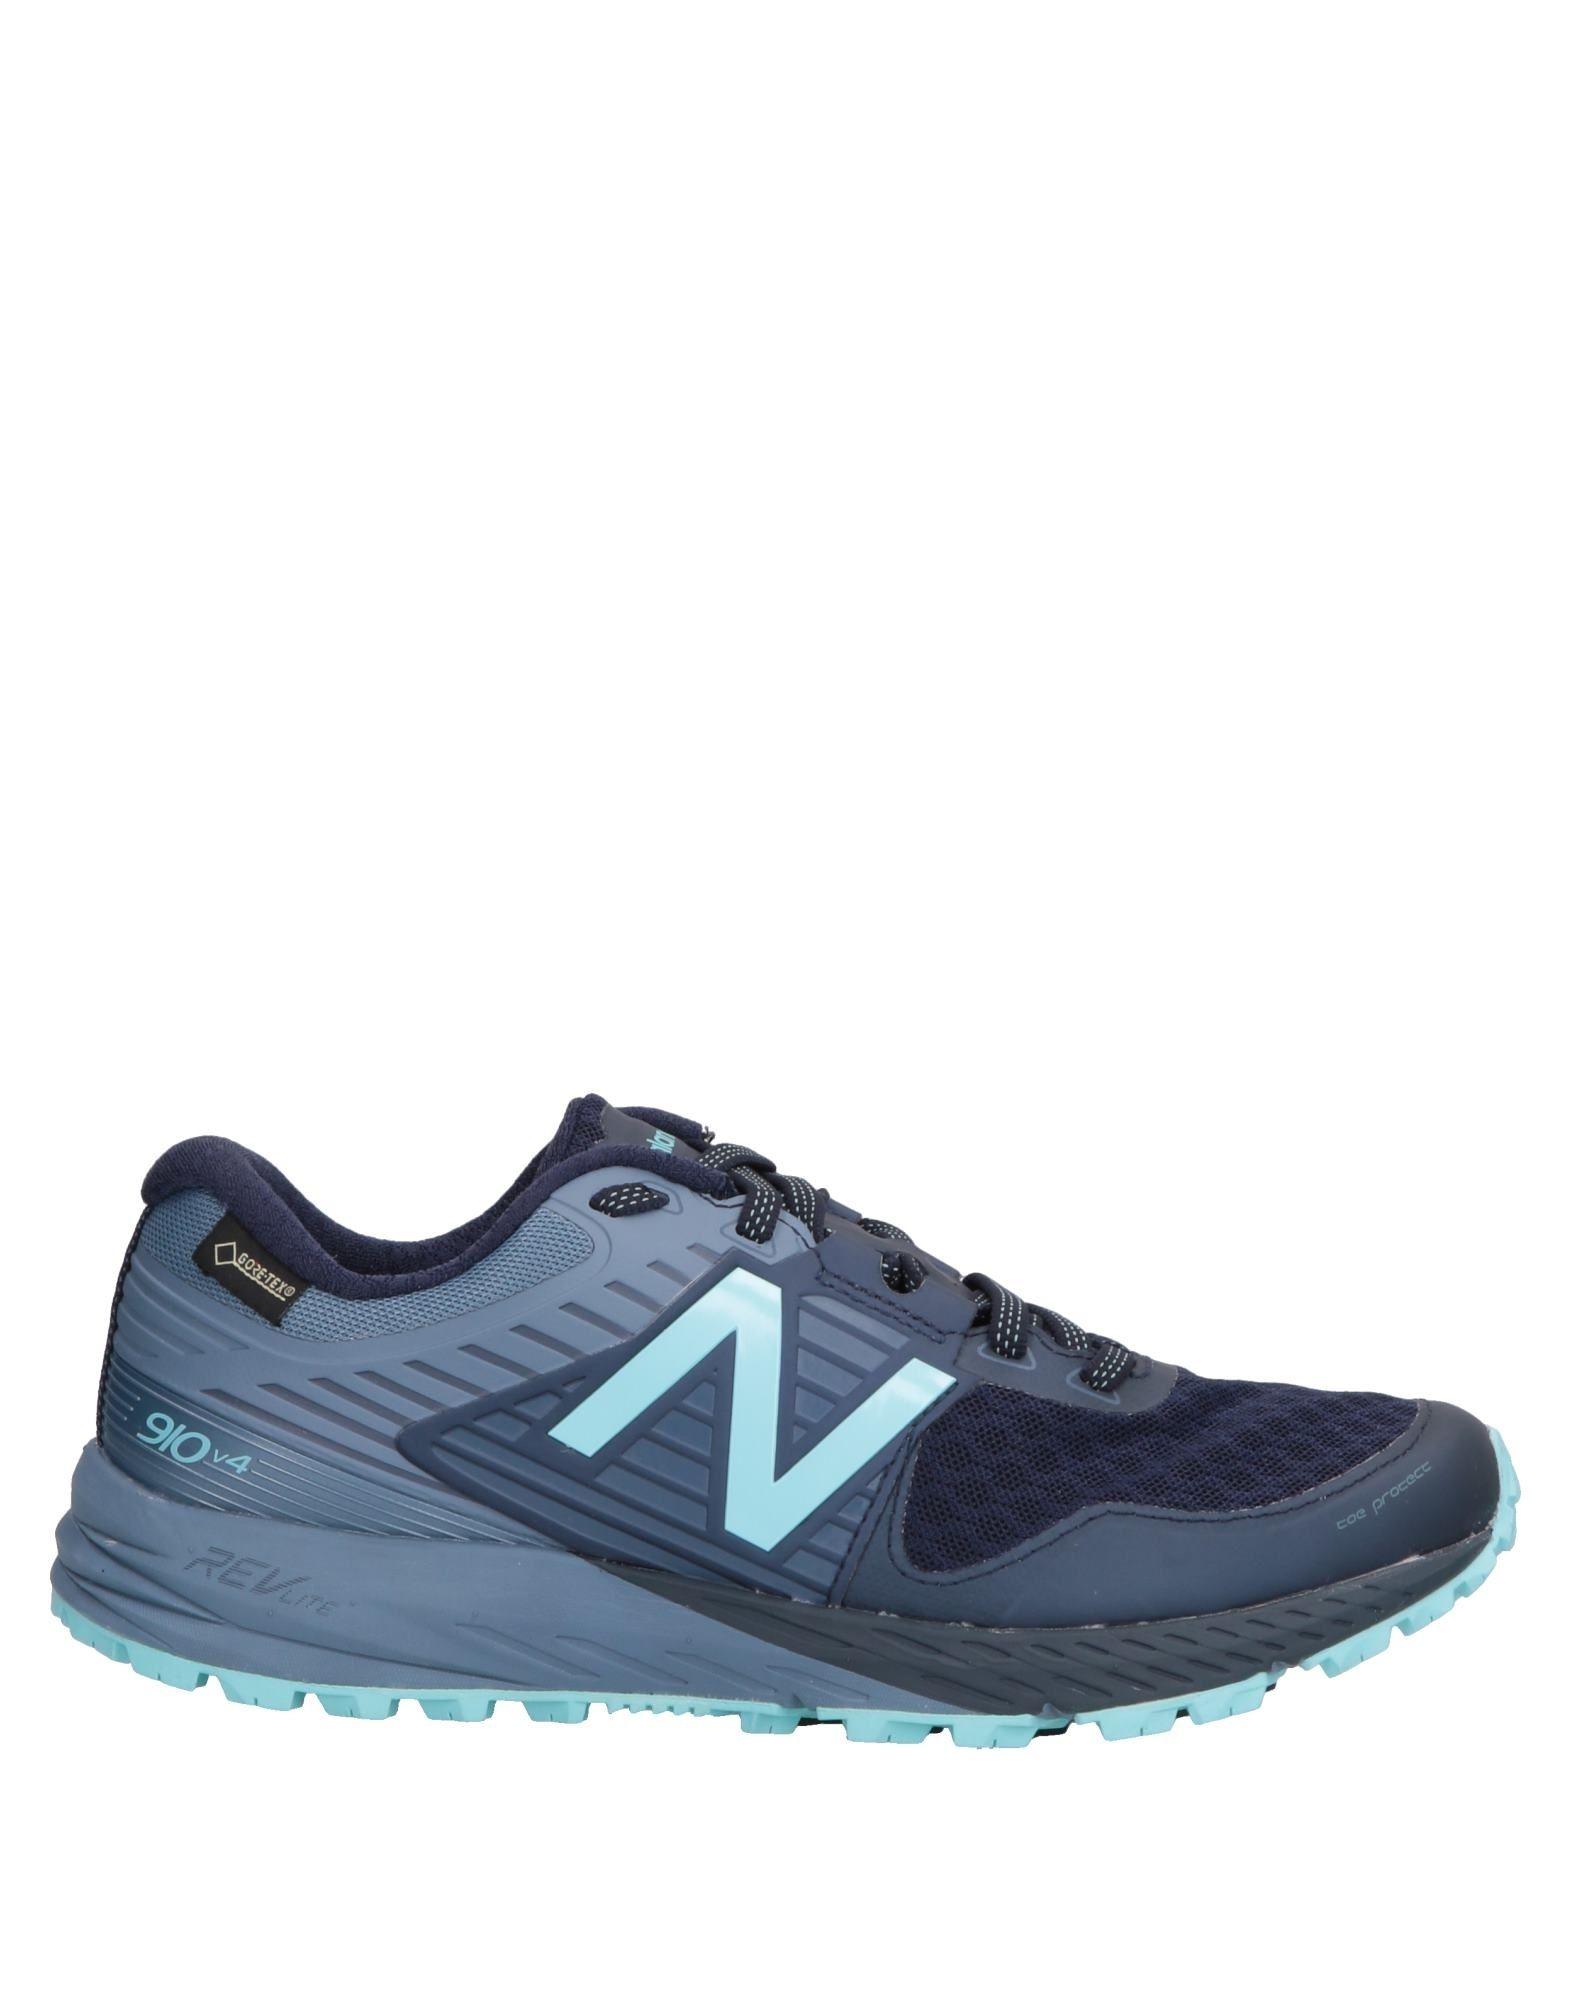 New Balance Sneakers - Women New Balance Sneakers Kingdom online on  United Kingdom Sneakers - 11569901ST 503085